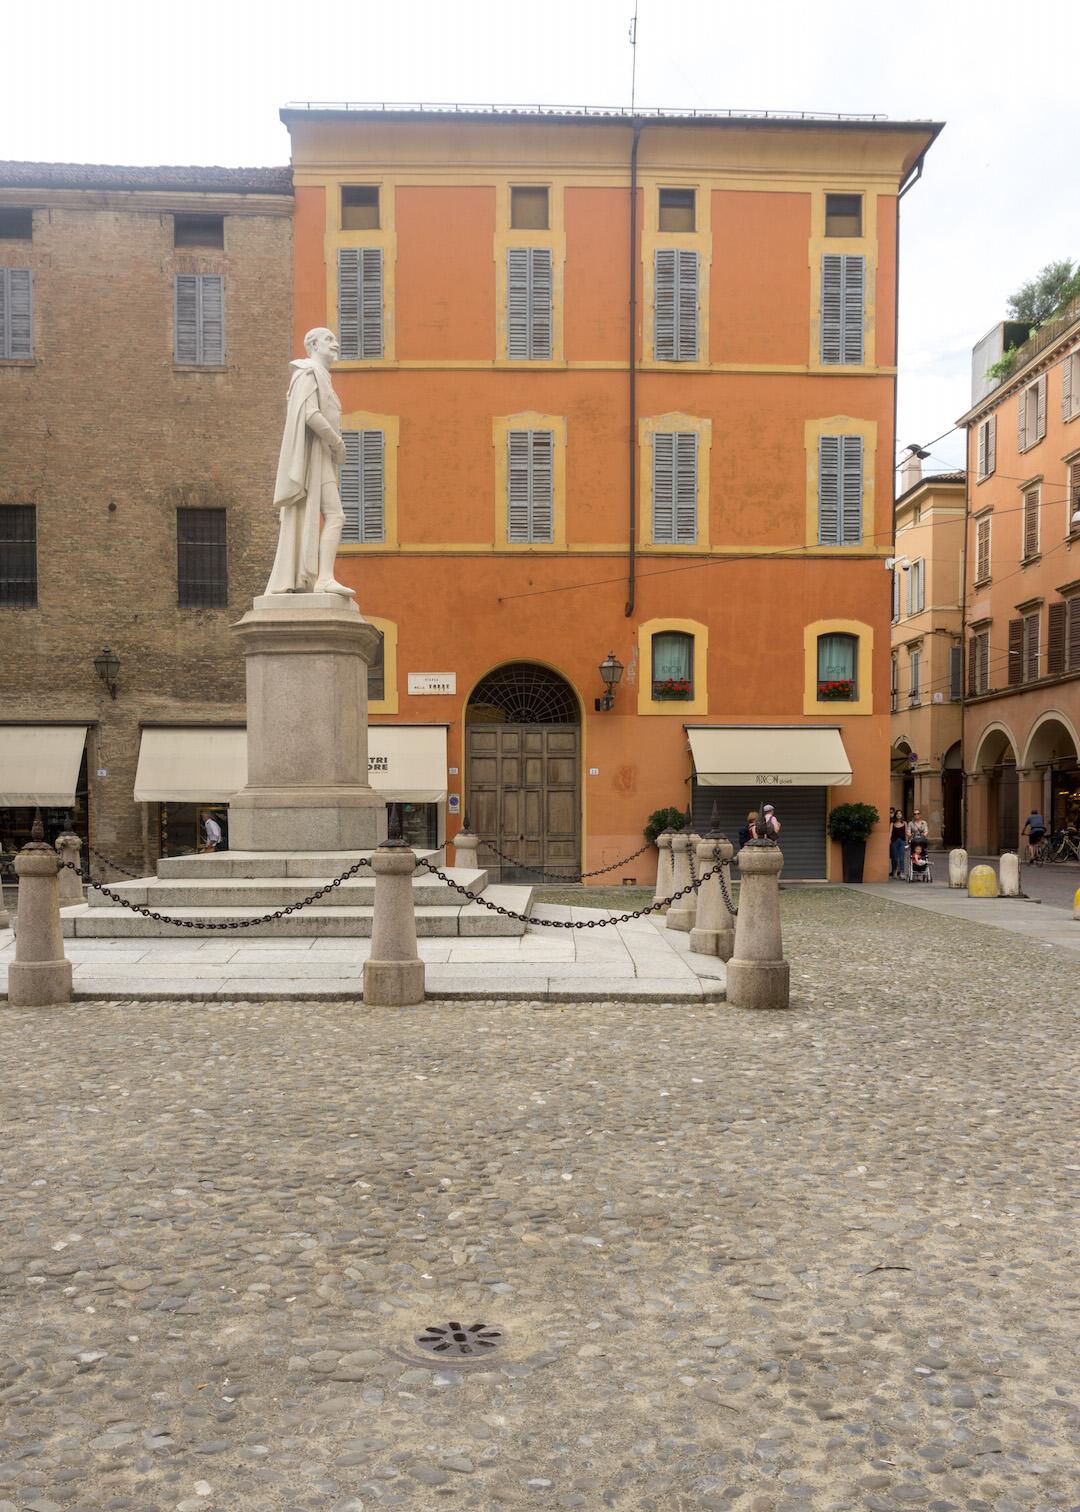 Her_Travel_Edit_Modena_Center